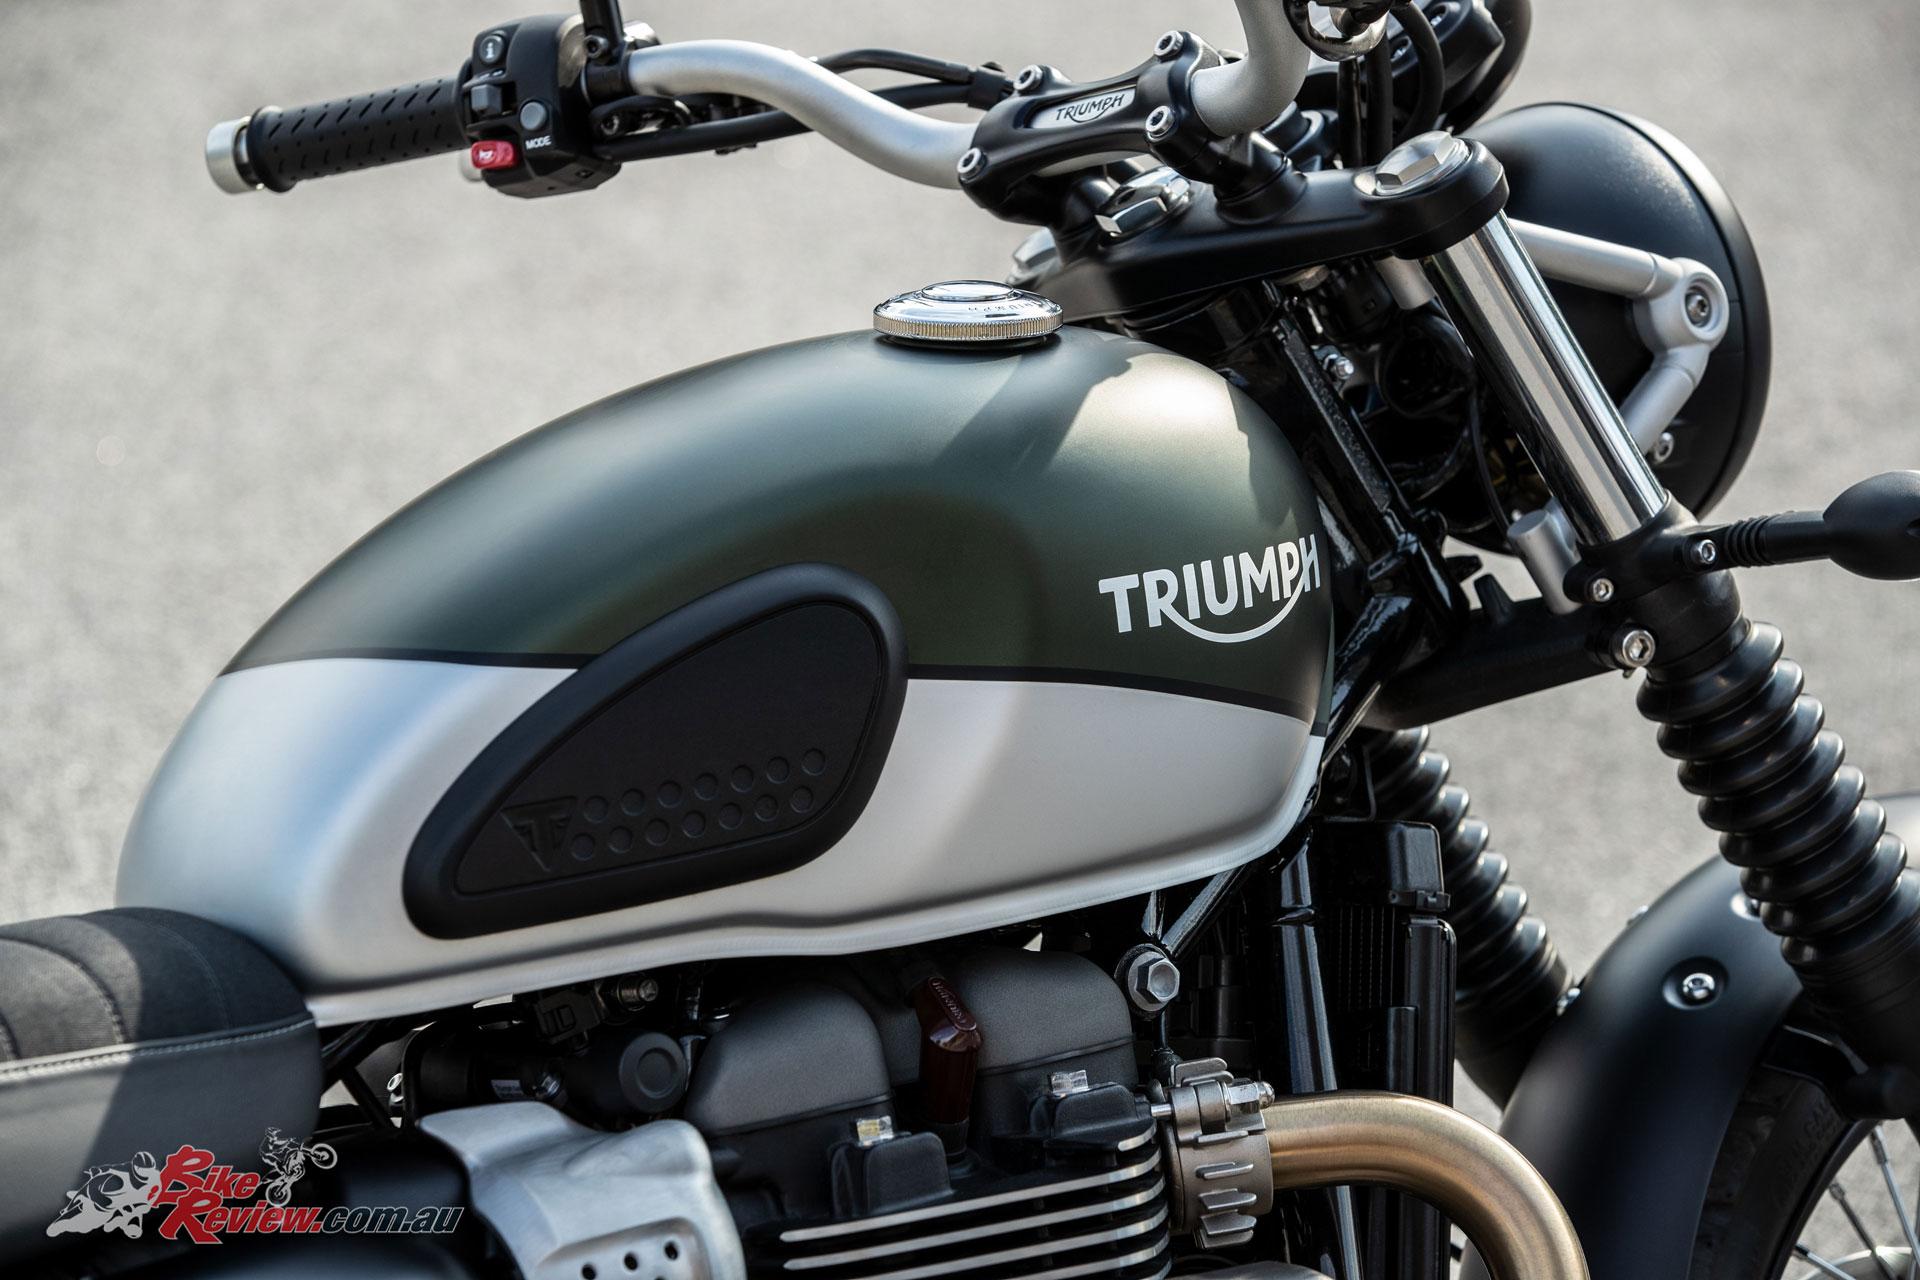 2019 Triumph Street Twin Seat Height